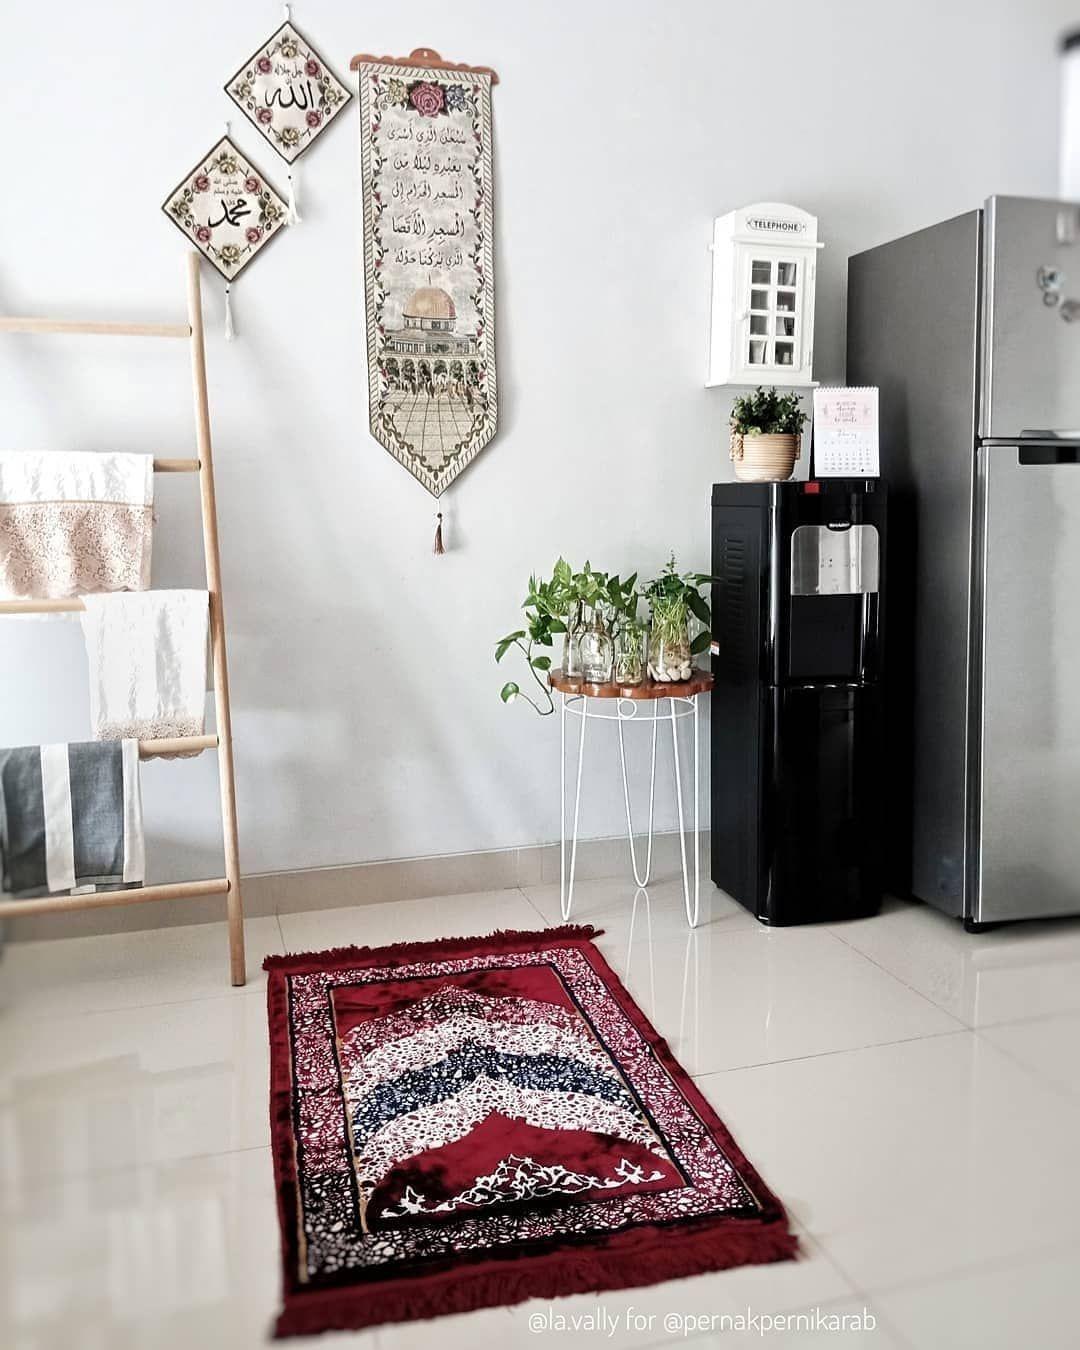 "RUMAH MINIMALIS 🇮🇩 on Instagram: ""Contoh rumah minimalis terbaru 2019.  Follow @rumahminimalis_id untuk dapatkan contoh rumah minimalis terbaru.  Picture by :  @la.vally…"""